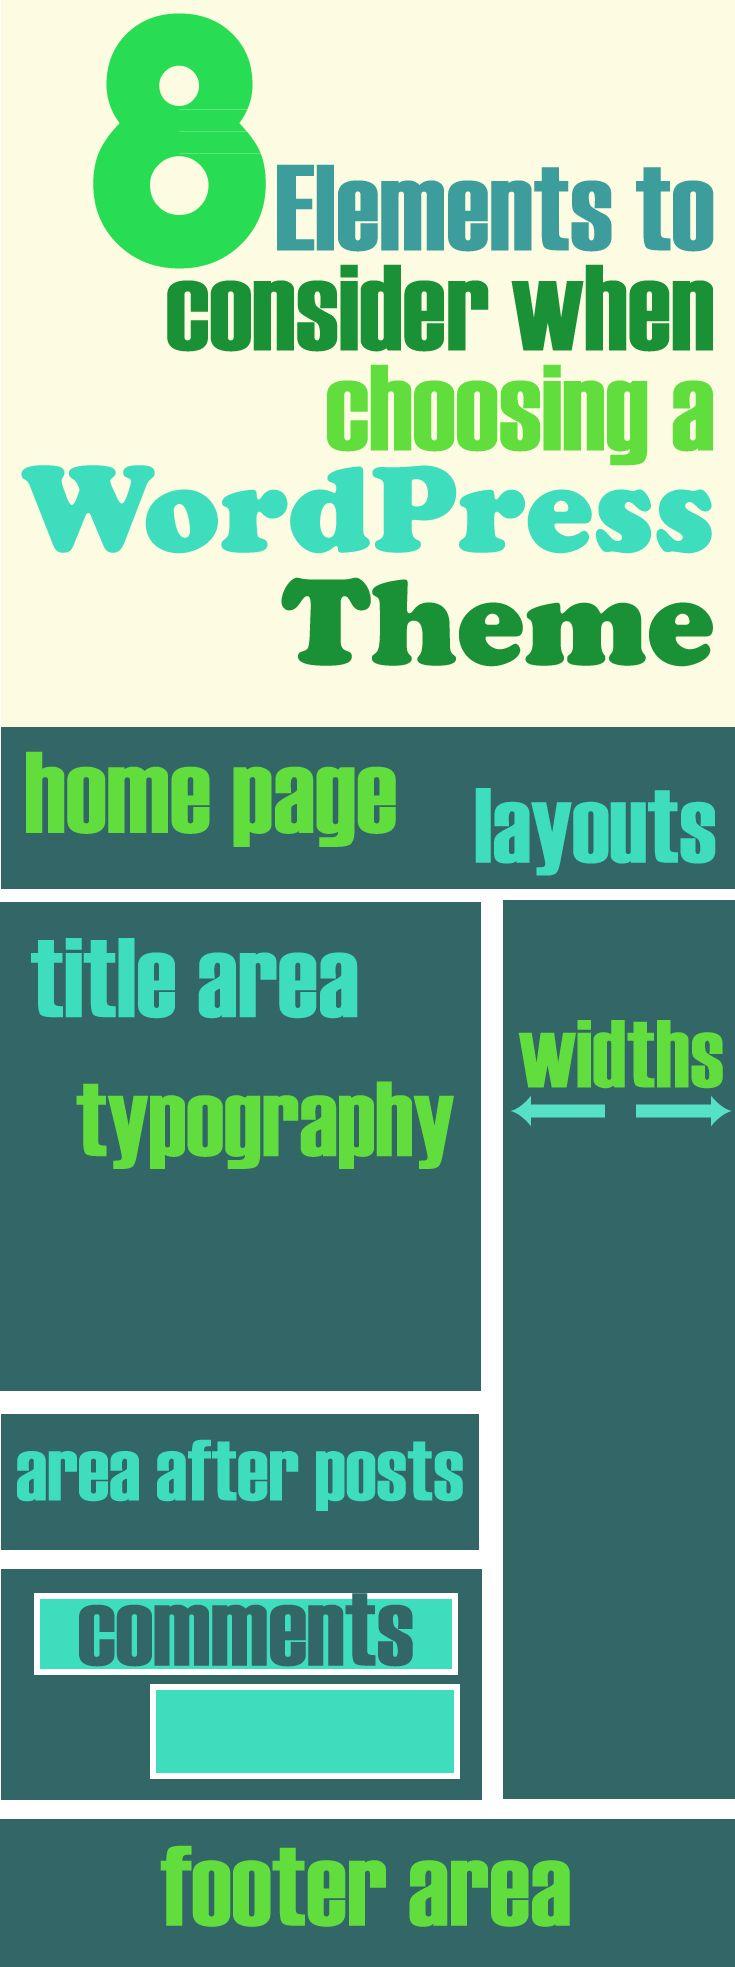 8 elements to consider when choosing a WordPress theme  22e52db4481a38087d68591bacc137fa